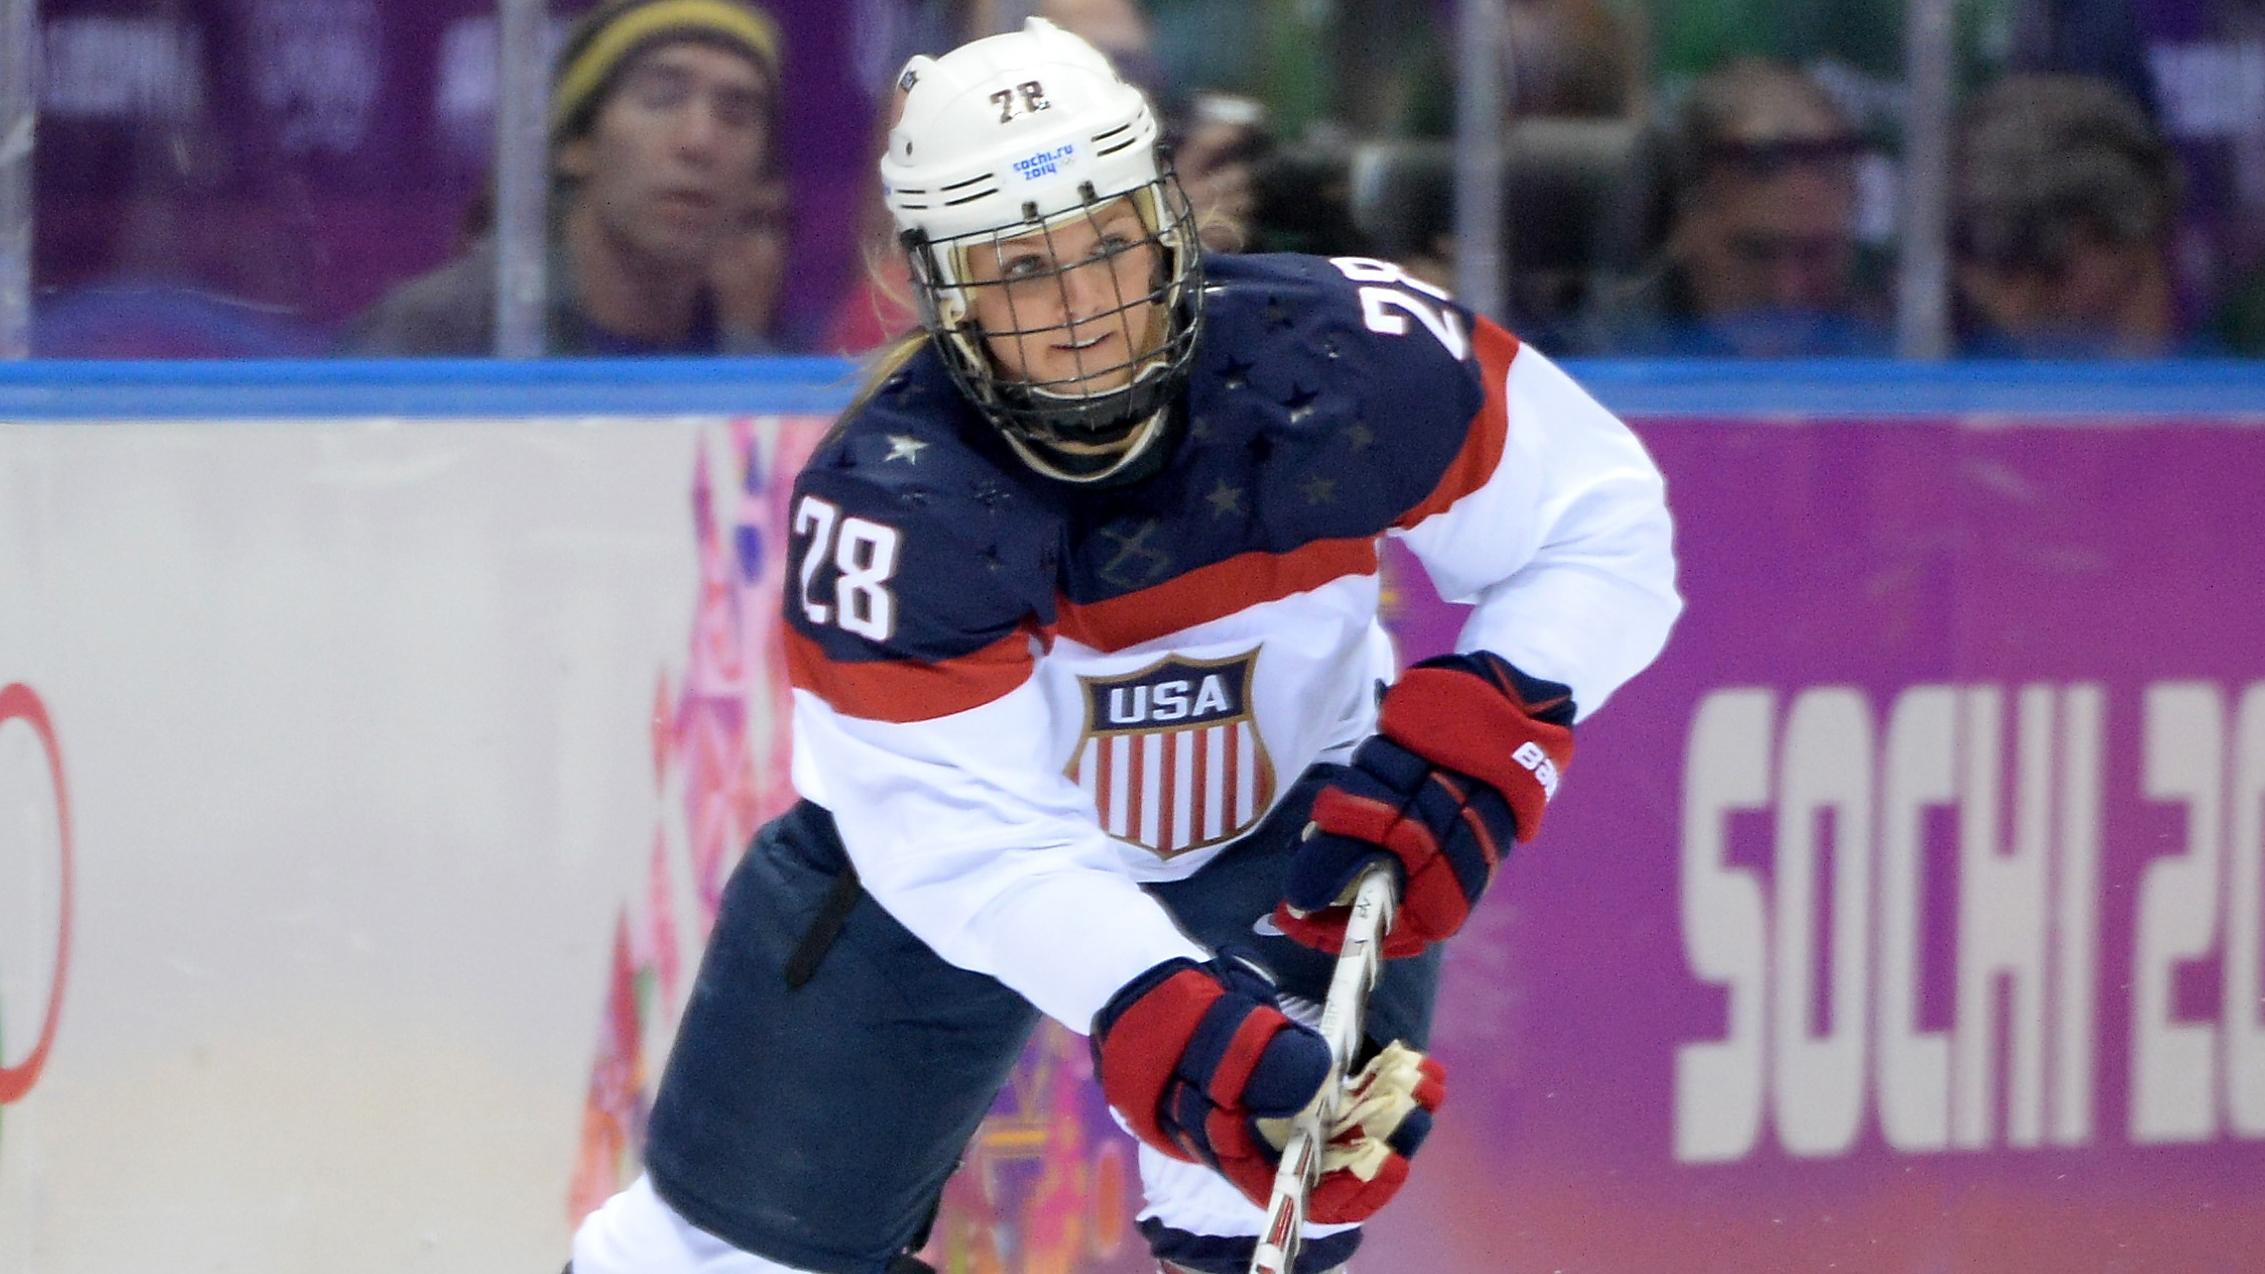 Amanda Kessel, sister of Toronto Maple Leafs F Phil Kessel, will not ...